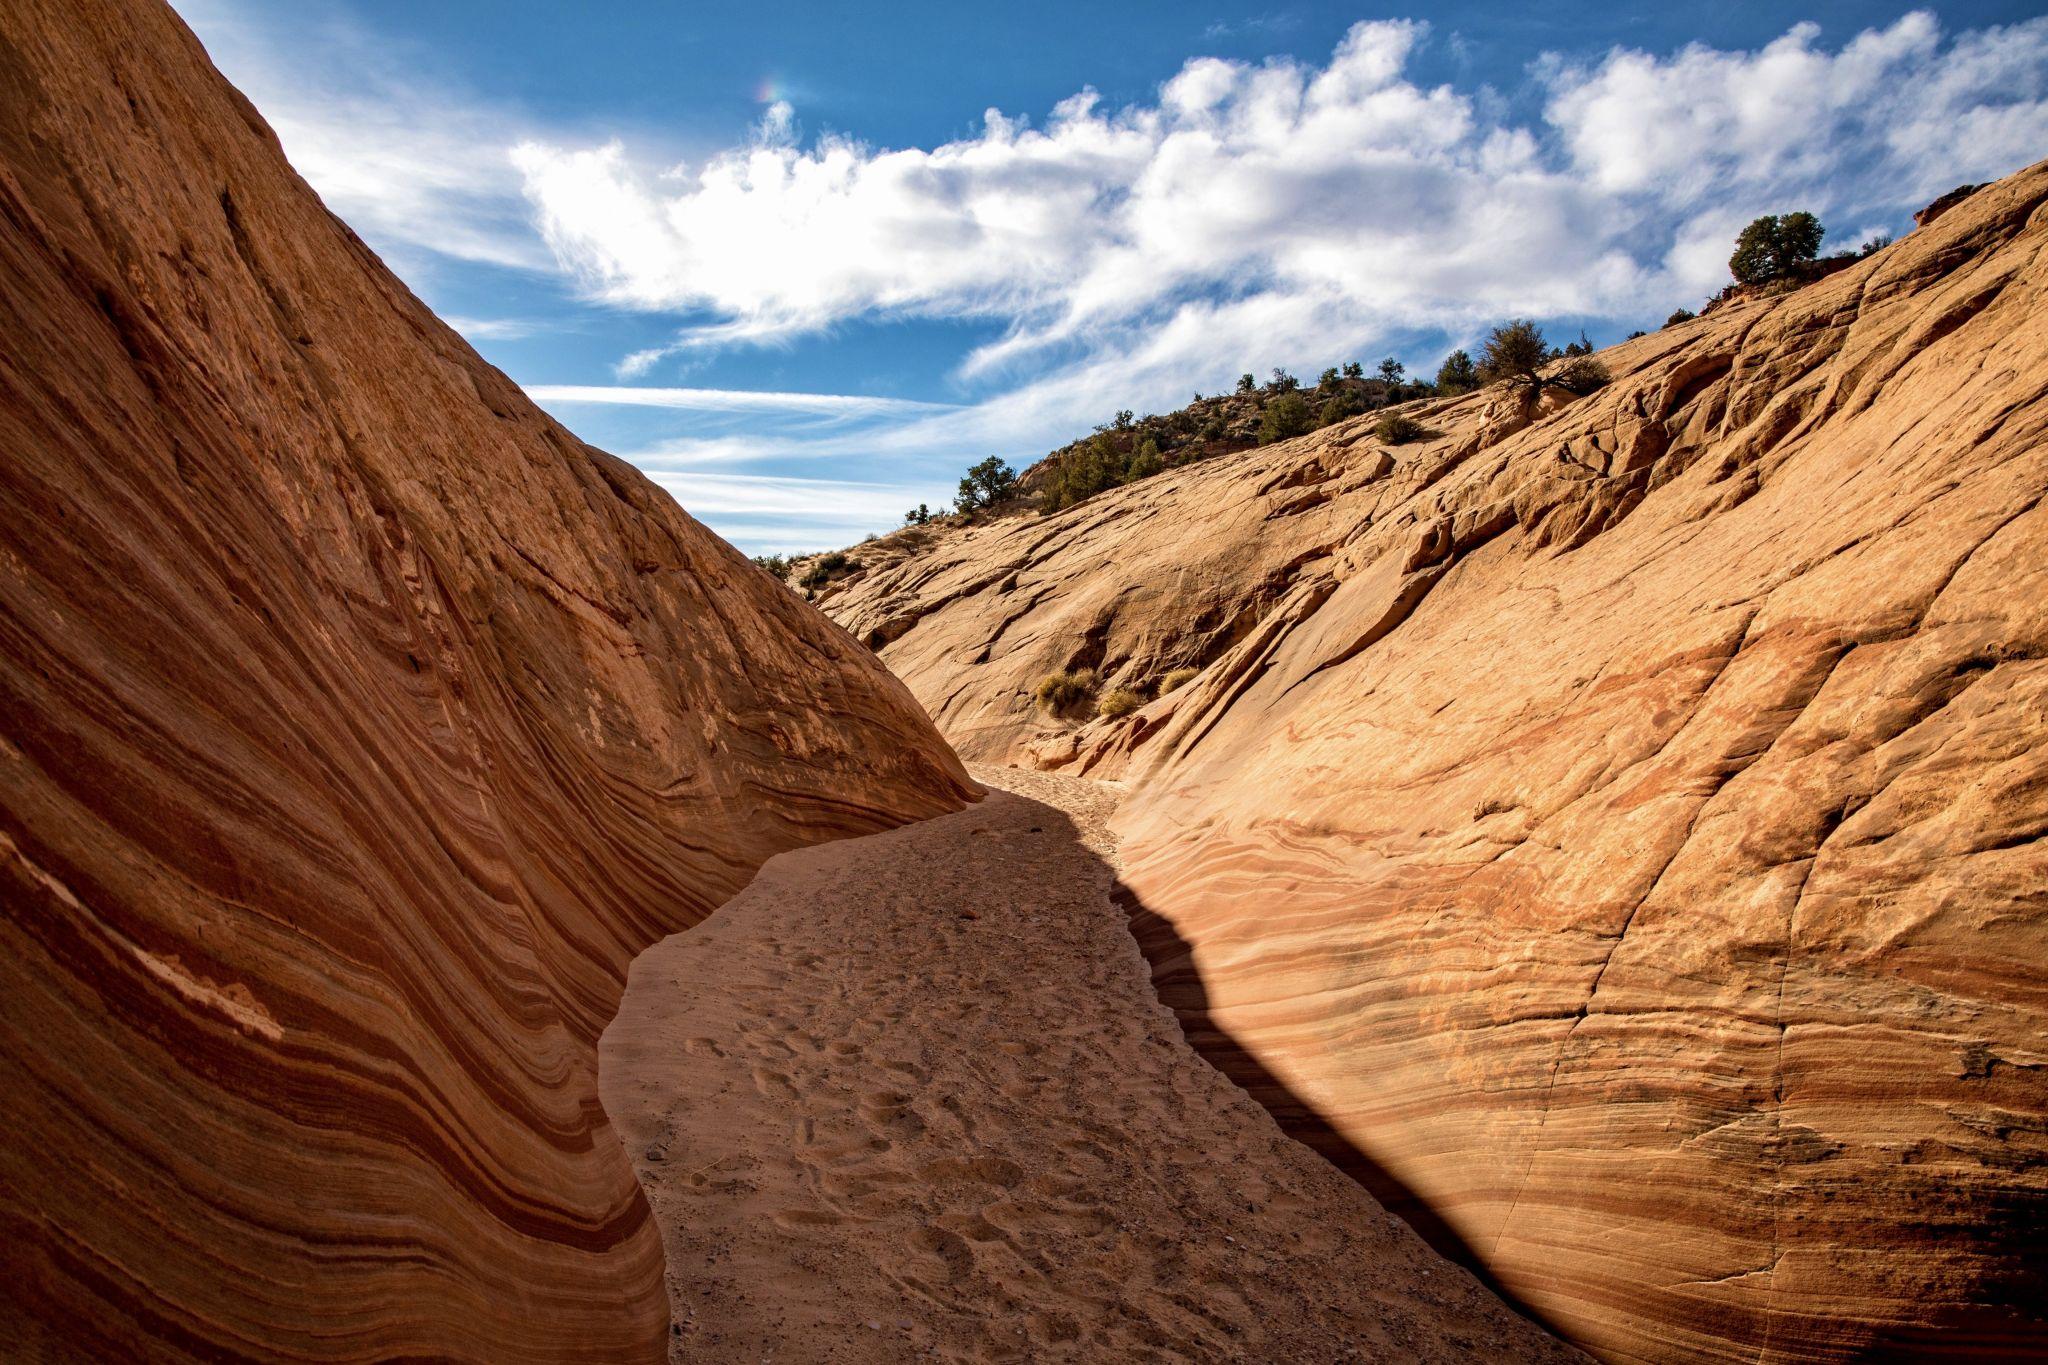 West Fork Bighorn Canyon, USA